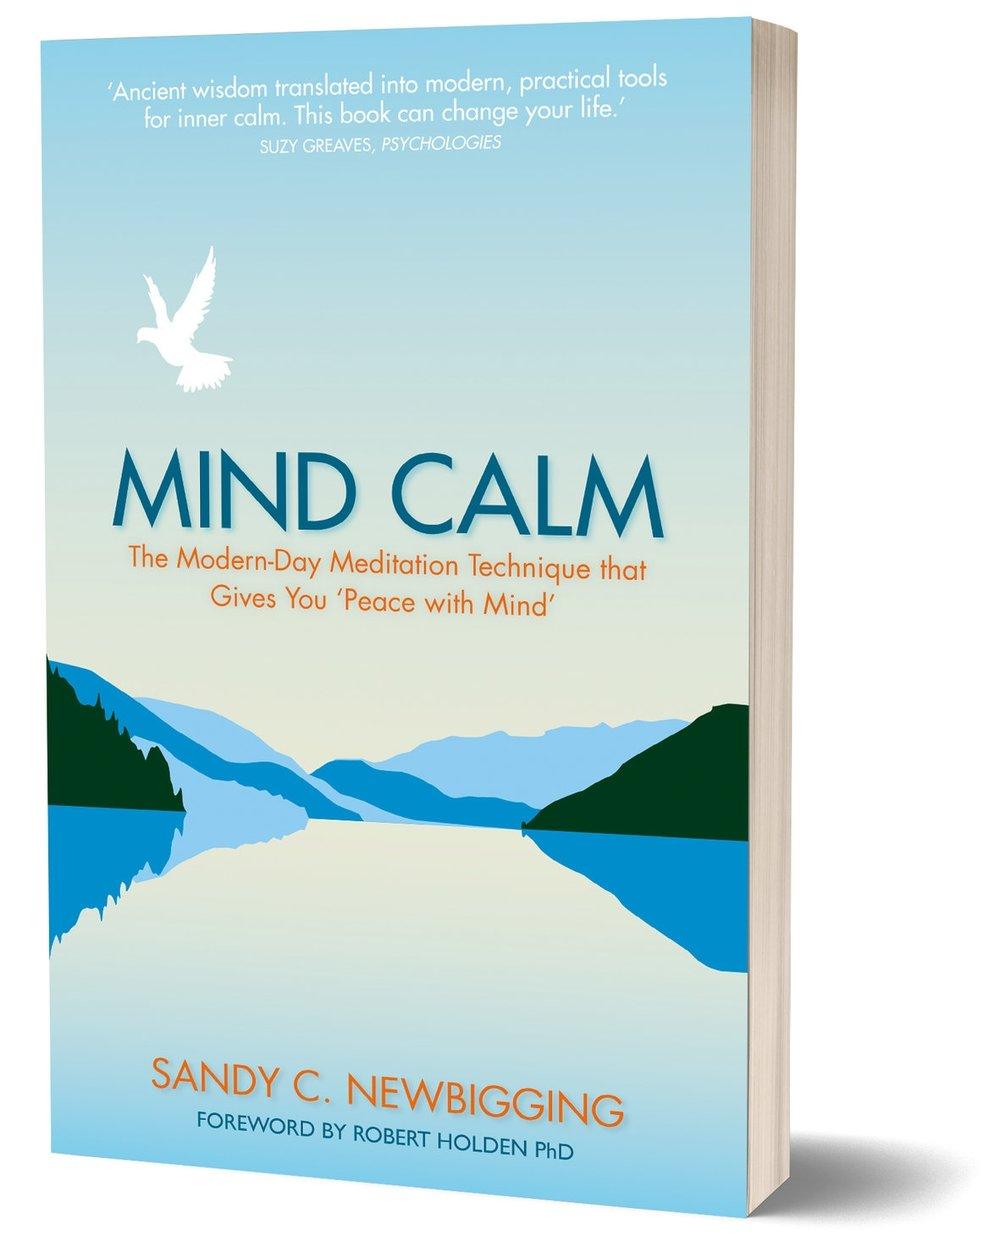 Mind Calm Front pb.jpg